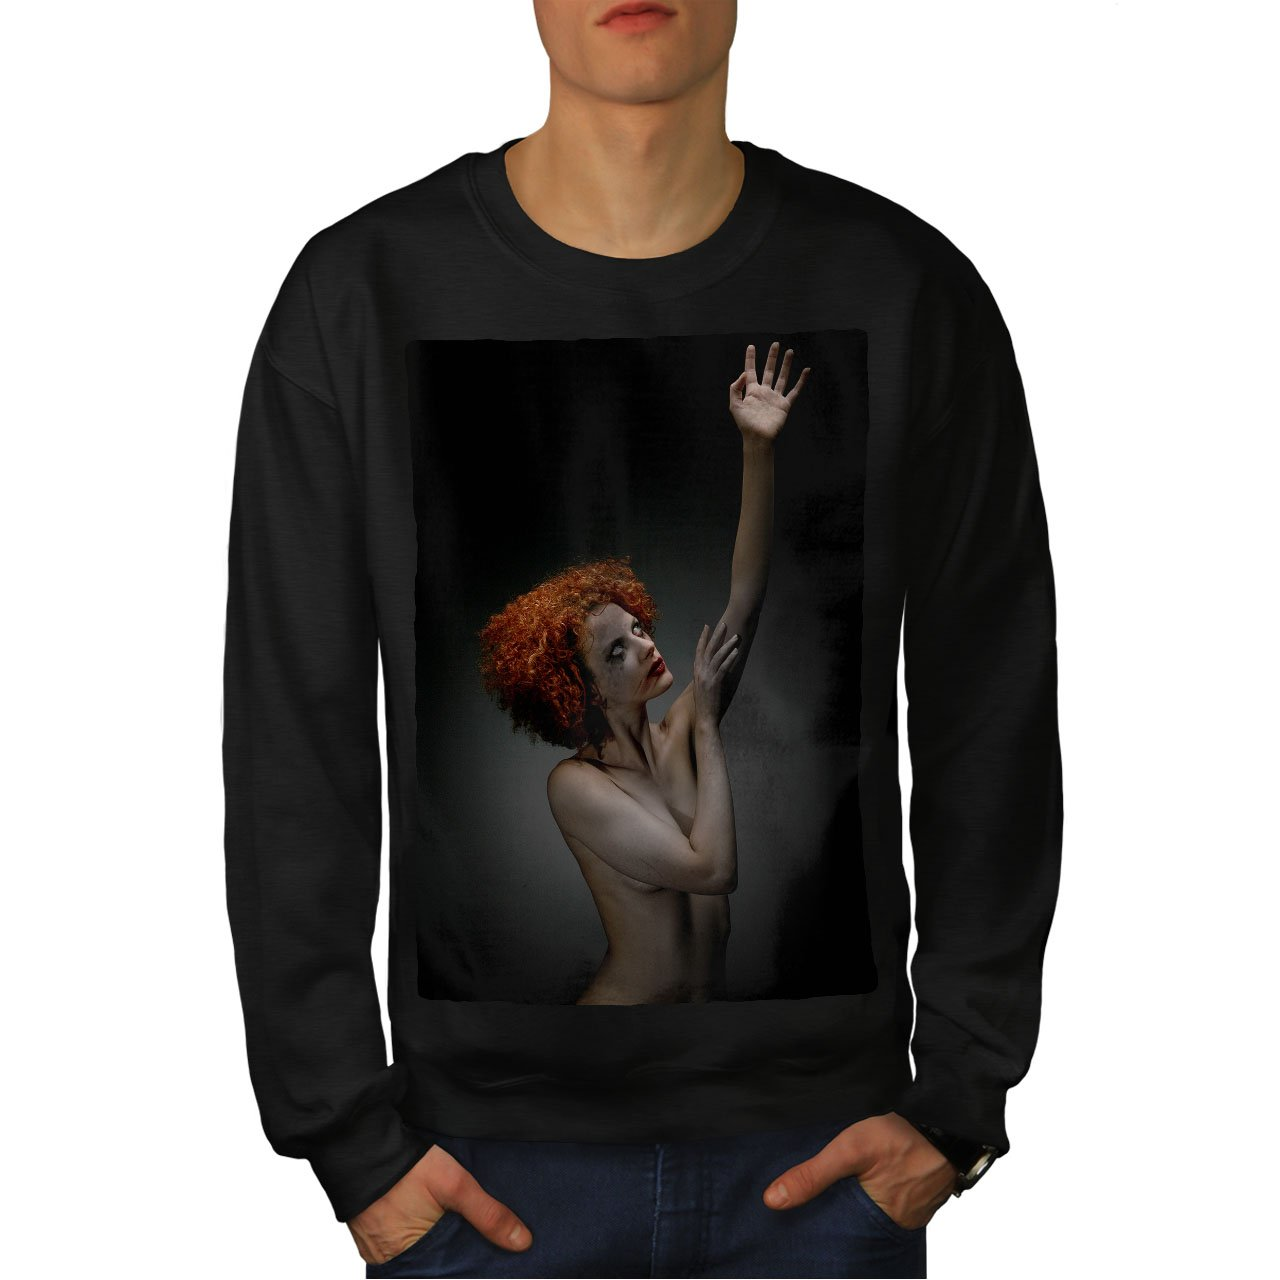 wellcoda Art Nude Hot Sensual Mens Sweatshirt Lady Casual Jumper